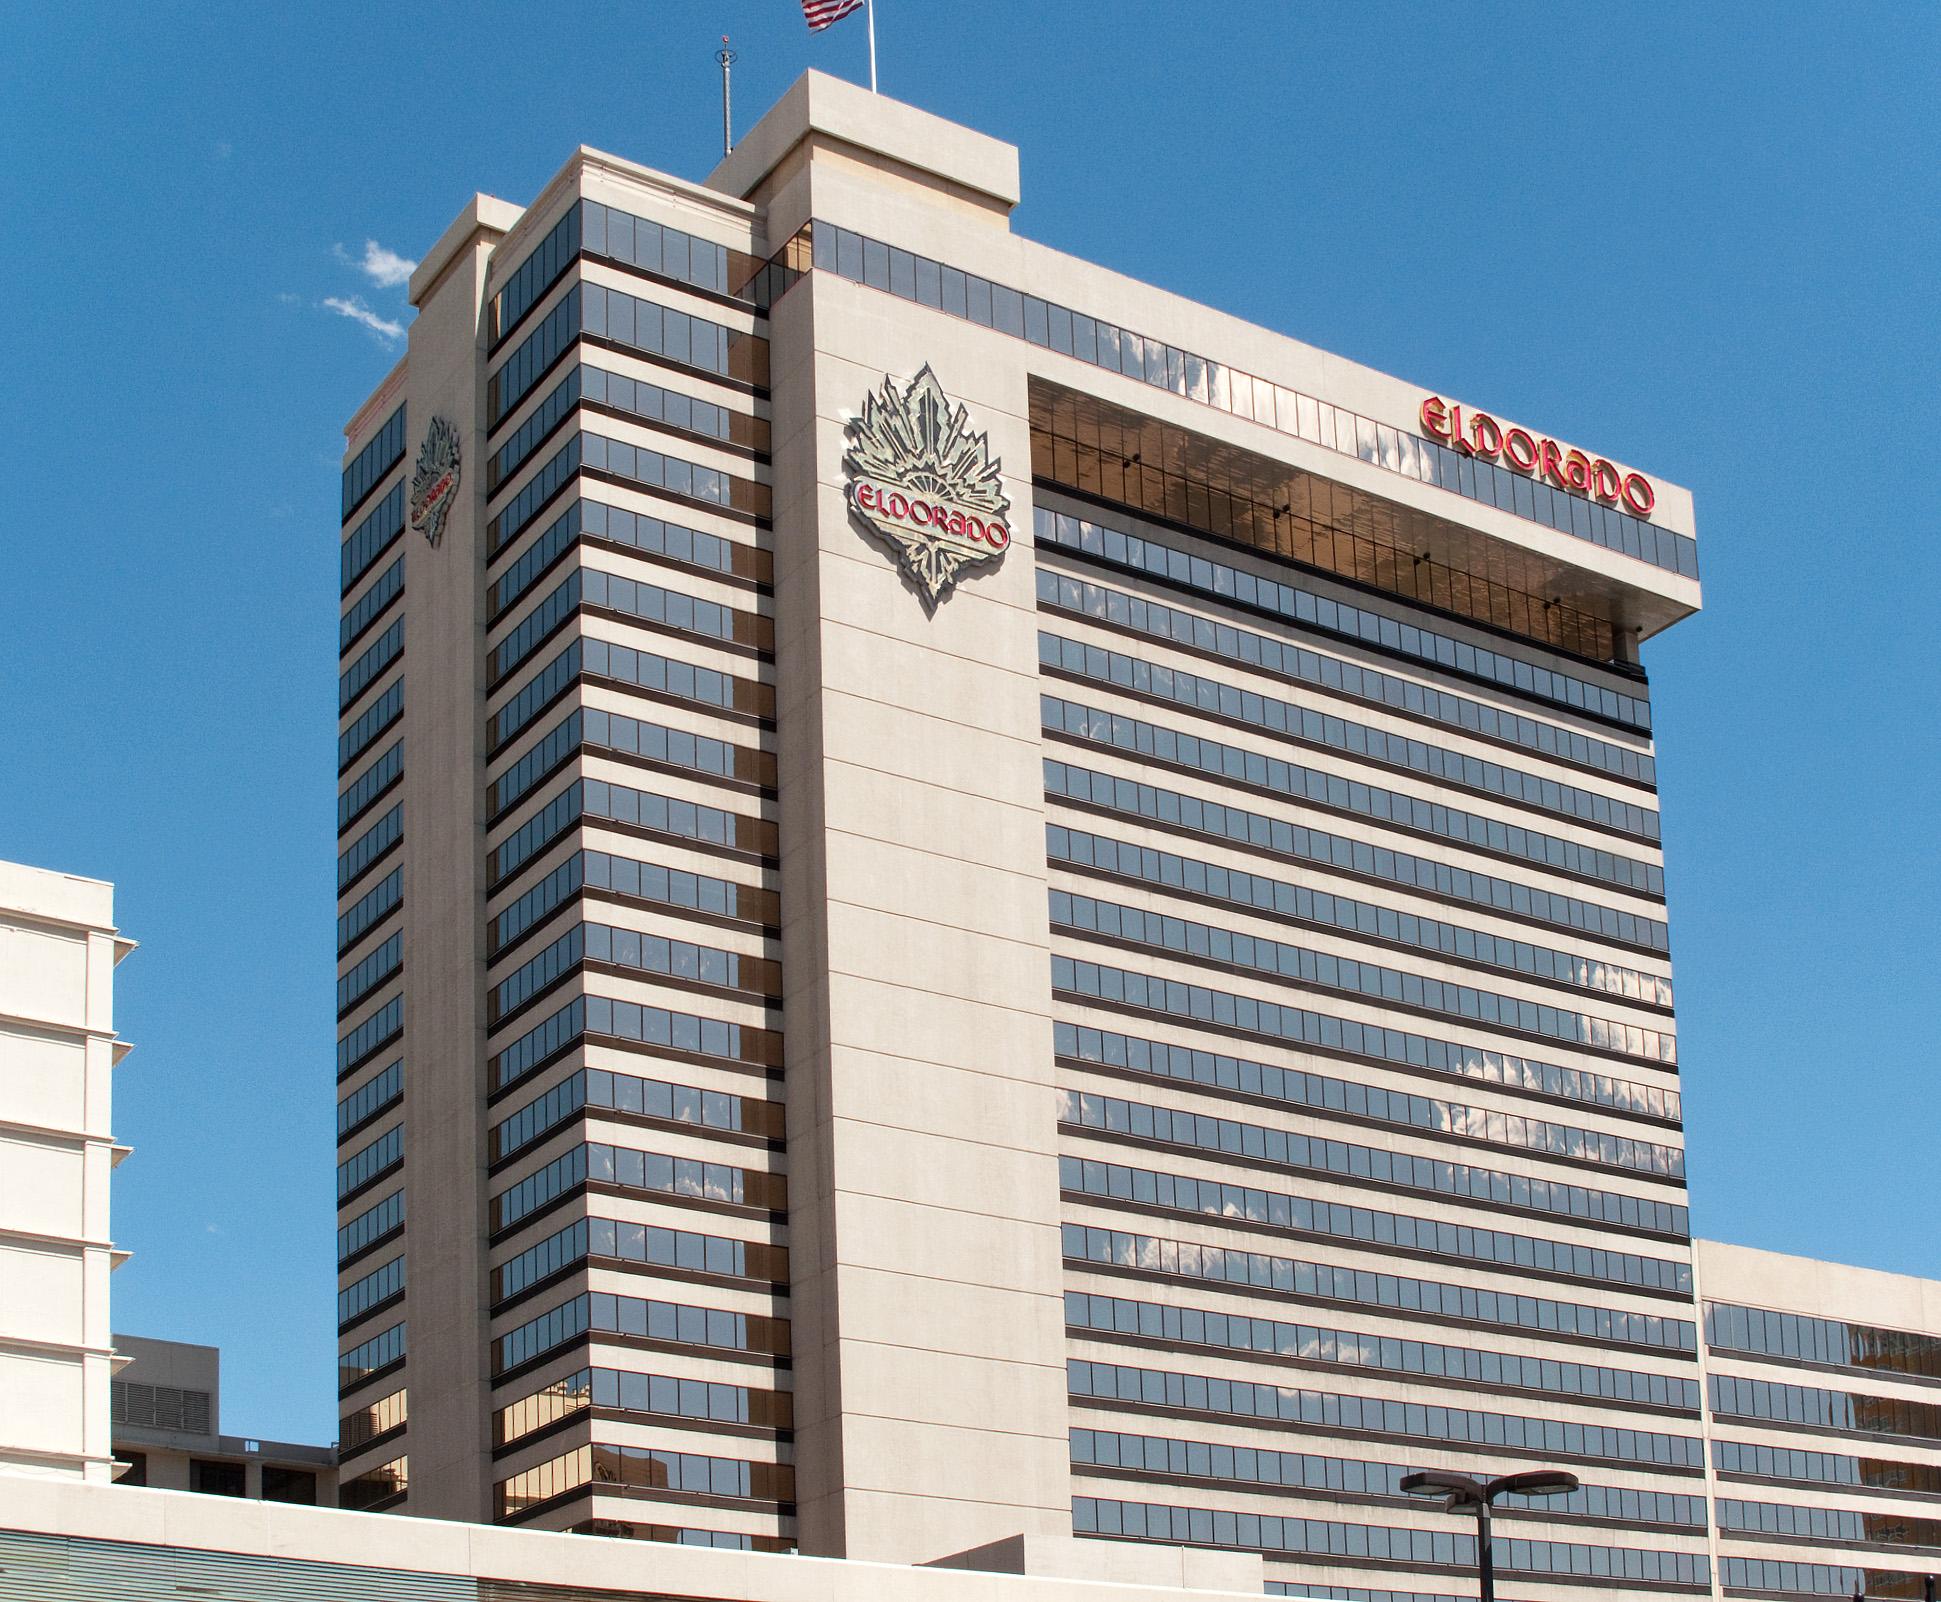 Eldorado hotel casino in reno bus trips to turning stone casino